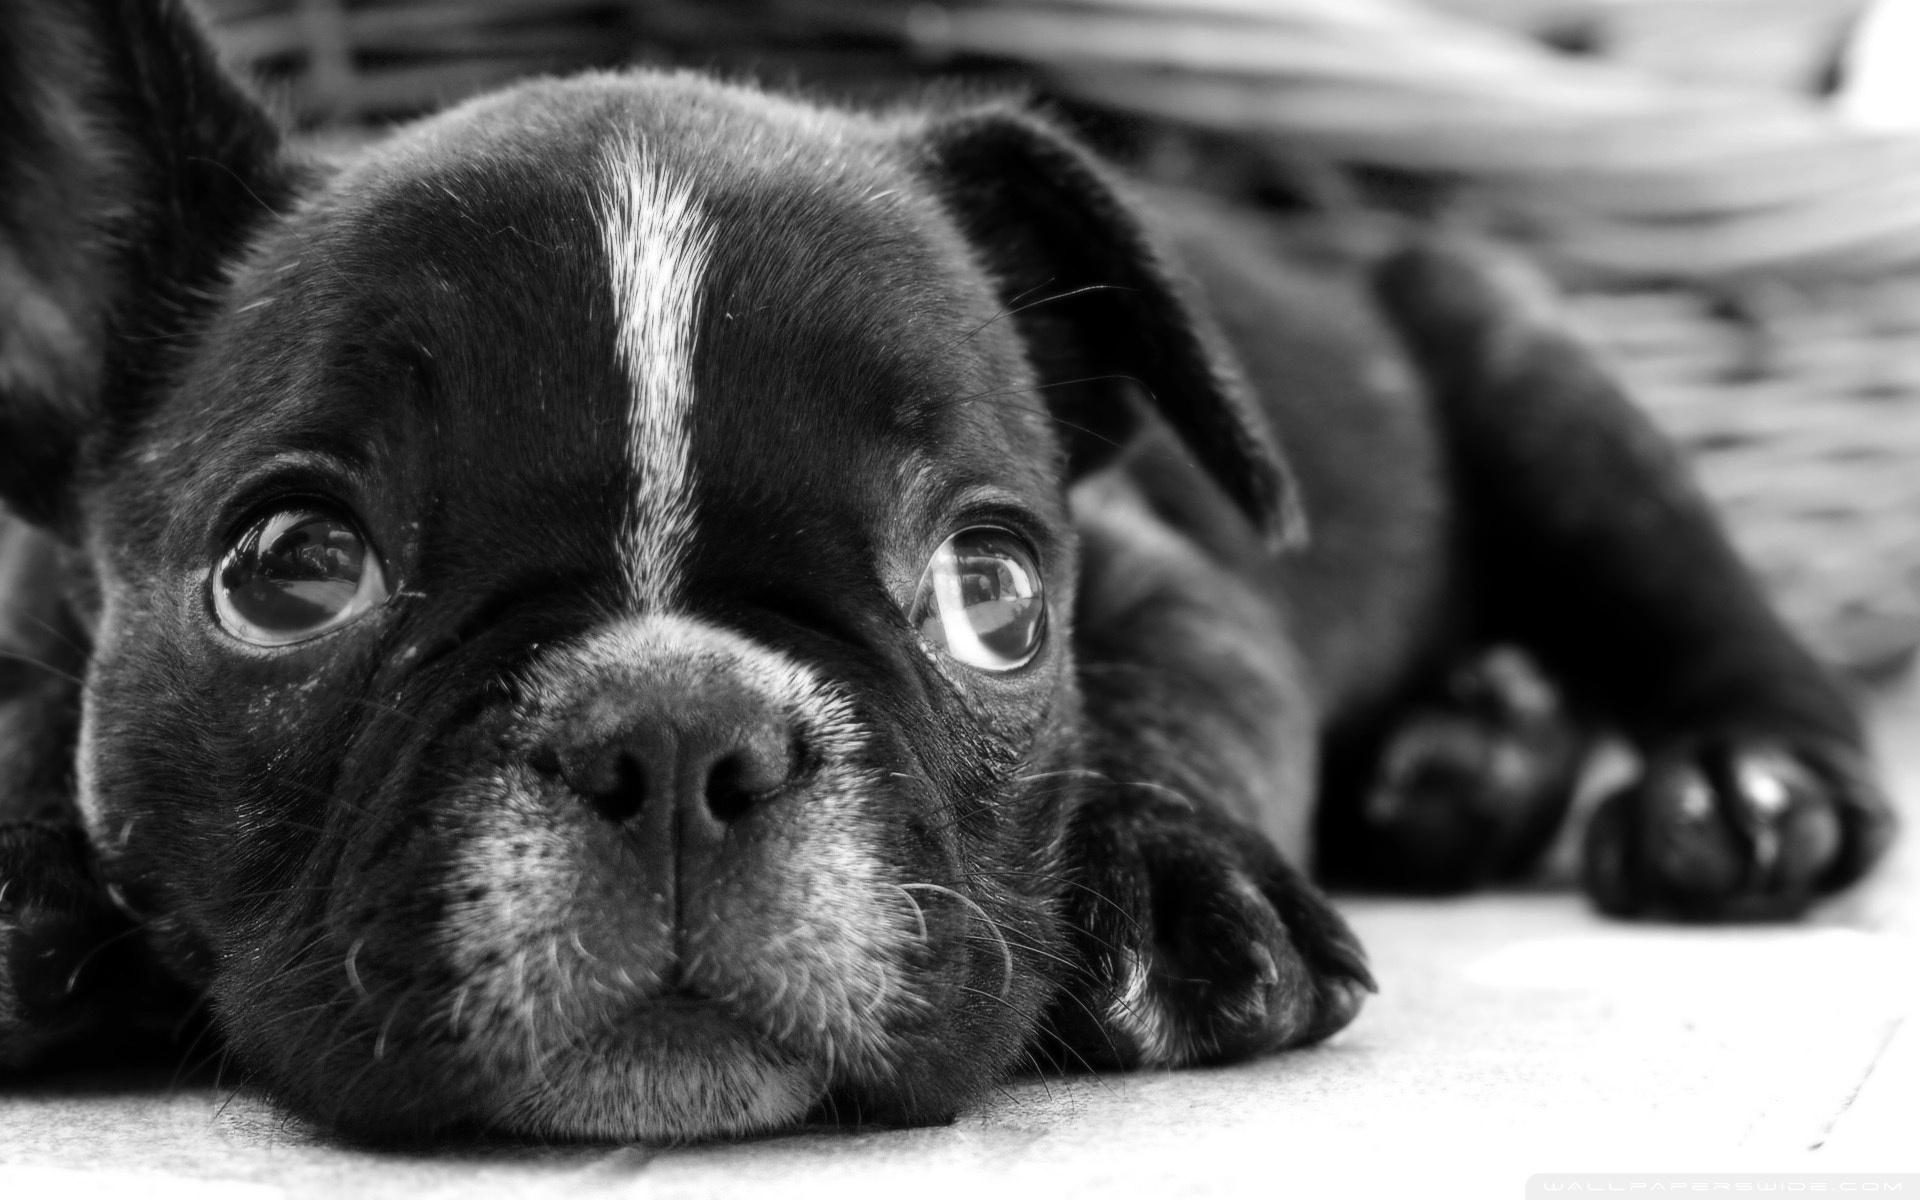 Chien Français Blanc et Noir Puppies: Chien French Bulldog S Breed